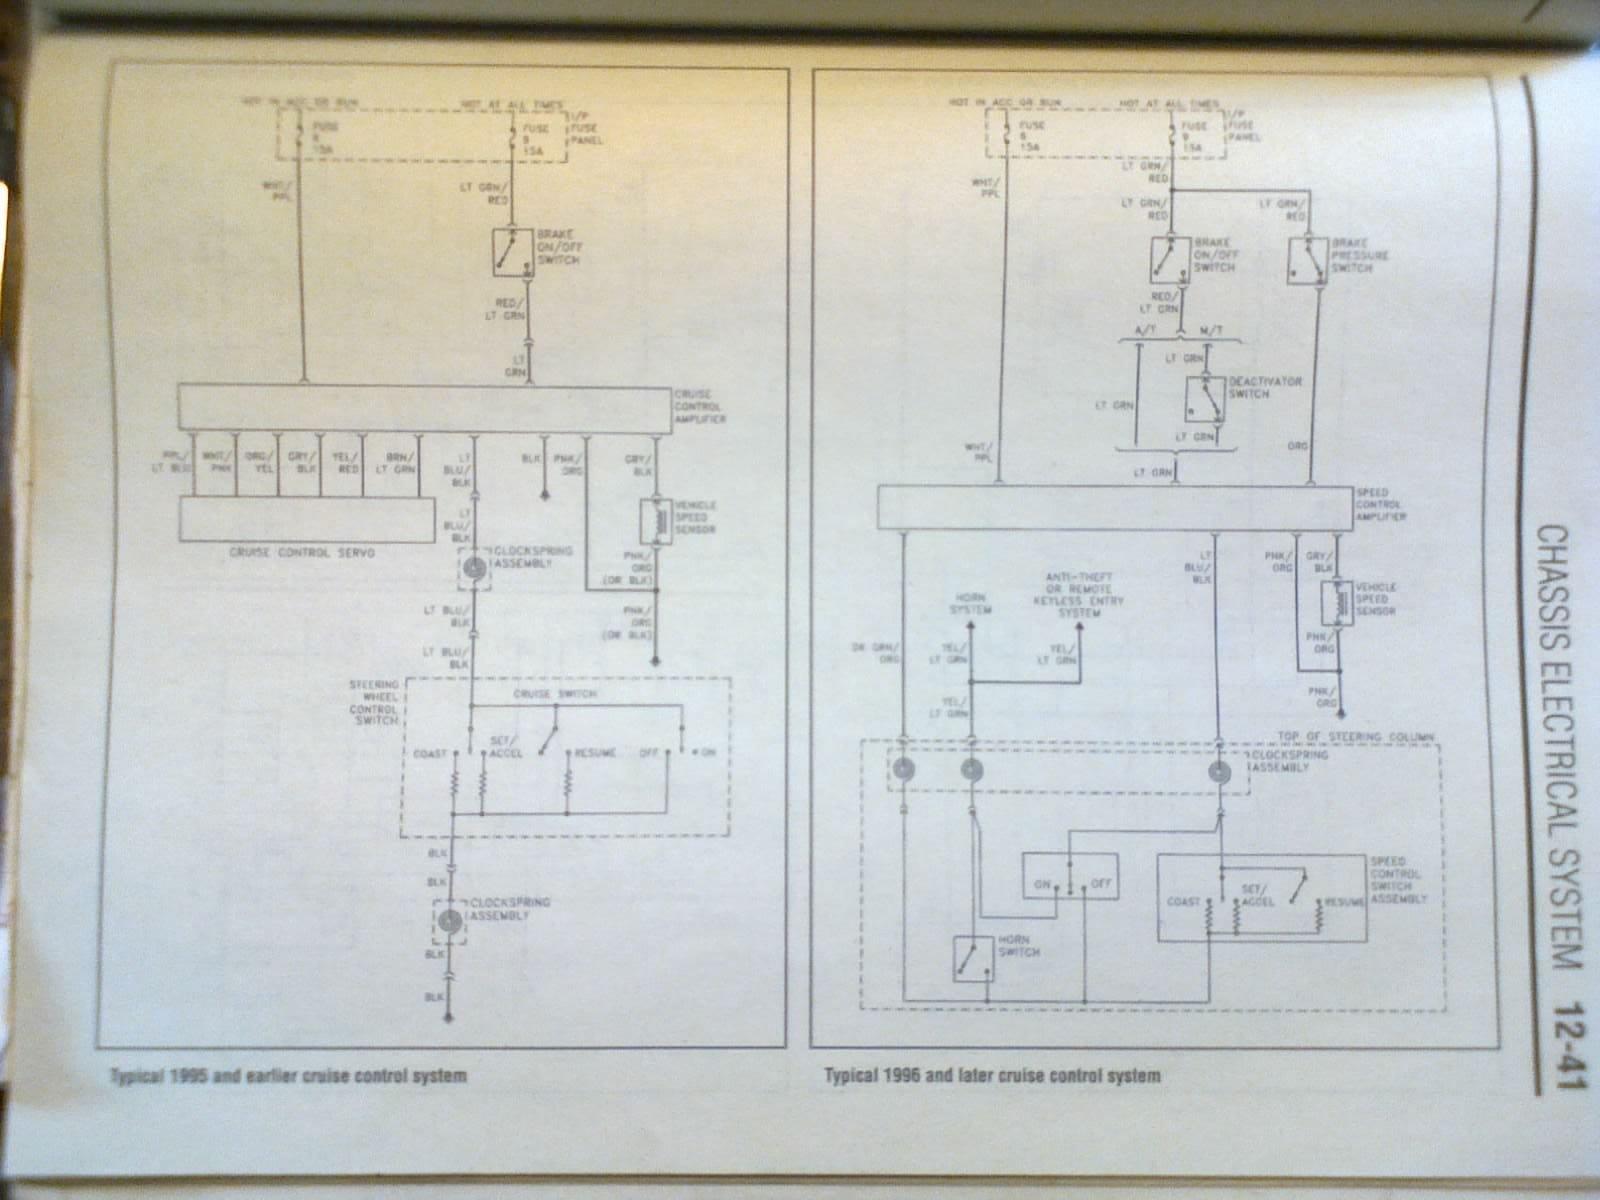 1995 mustang wiring diagram wiring diagram for 95 mustang gt wiring diagram data  wiring diagram for 95 mustang gt